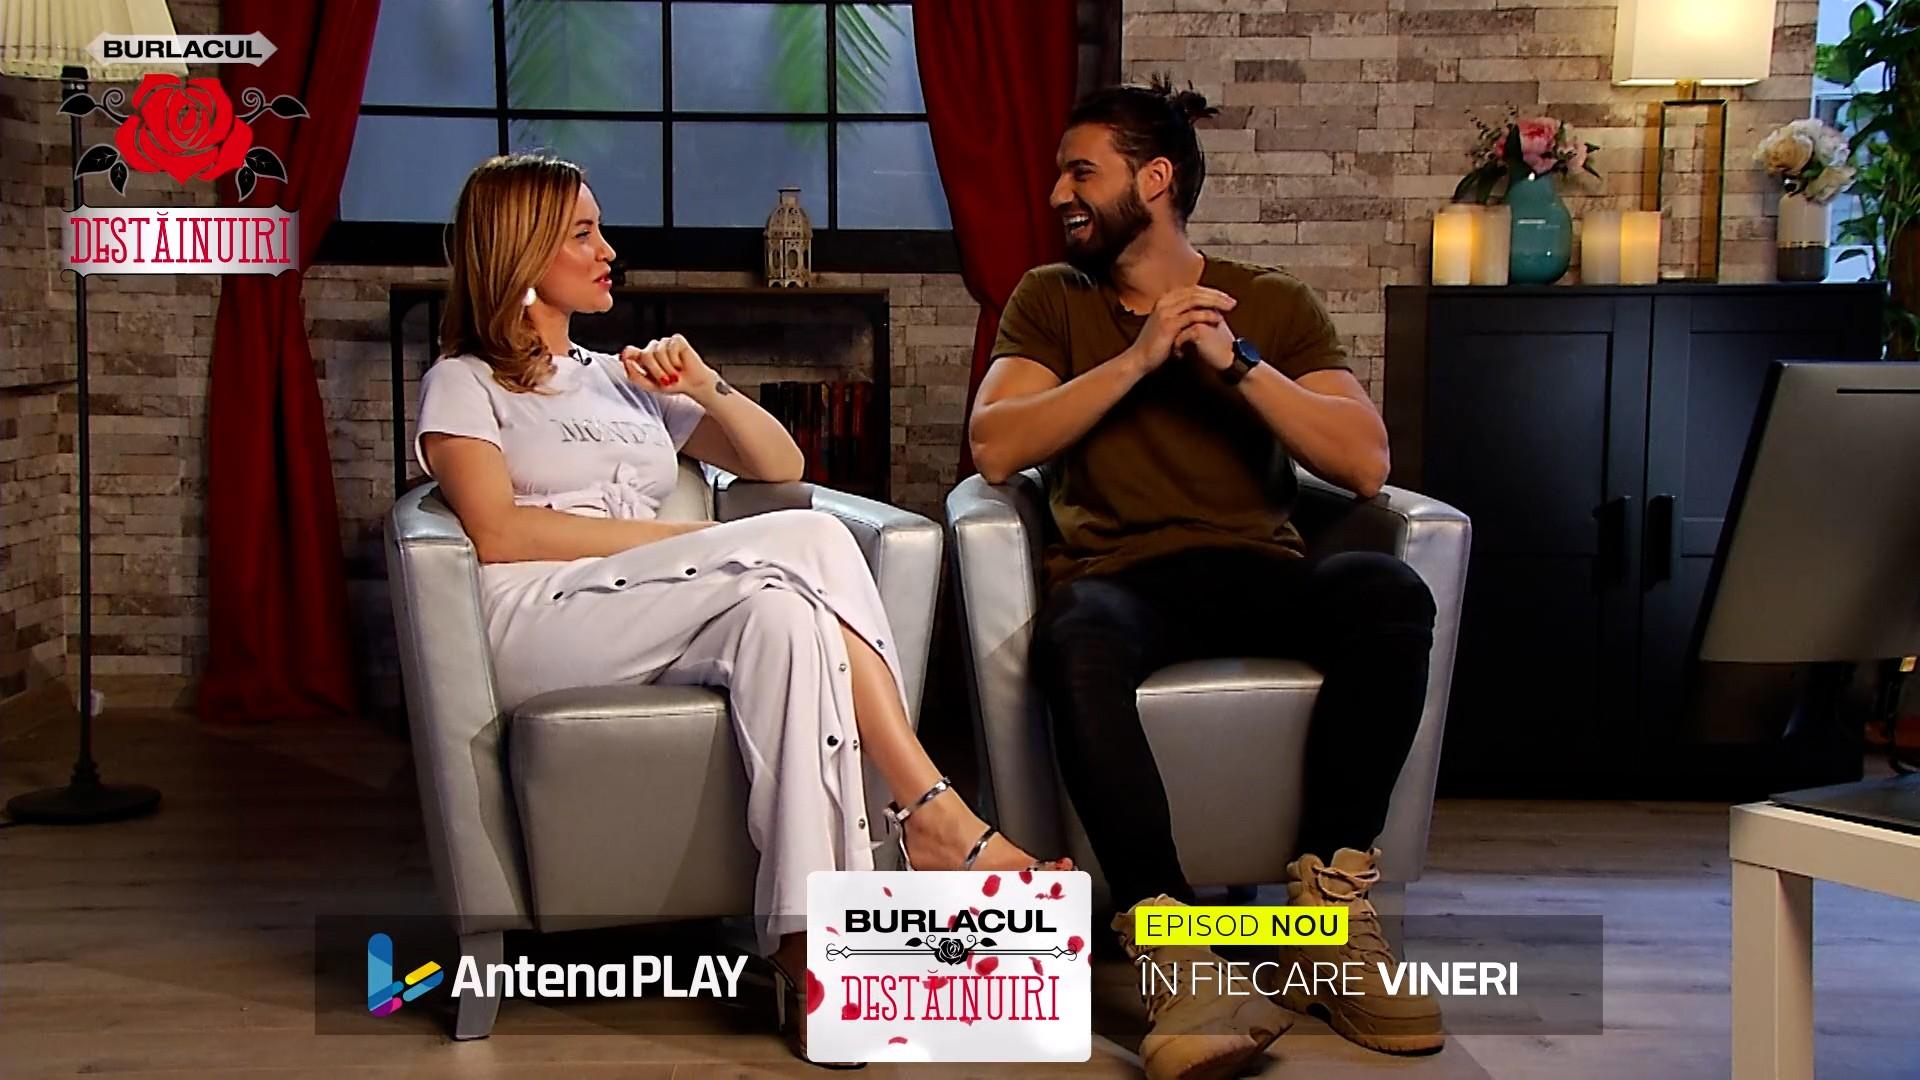 Burlacul - Destainuiri | Episodul 5